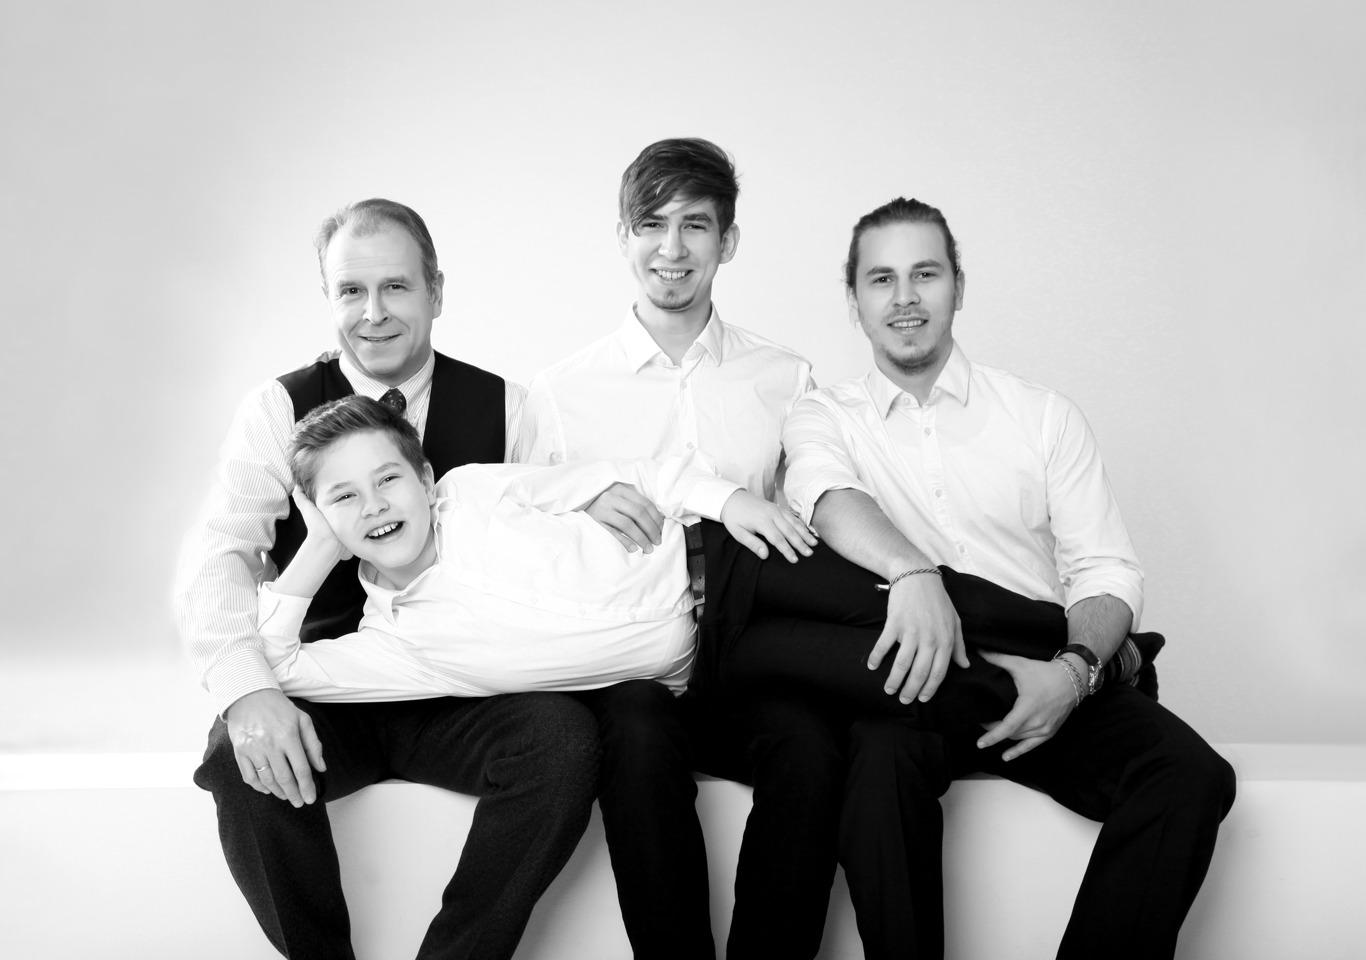 Familien / Family Shooting - LATE NIGHT TALES Christina Bulka Fotograf